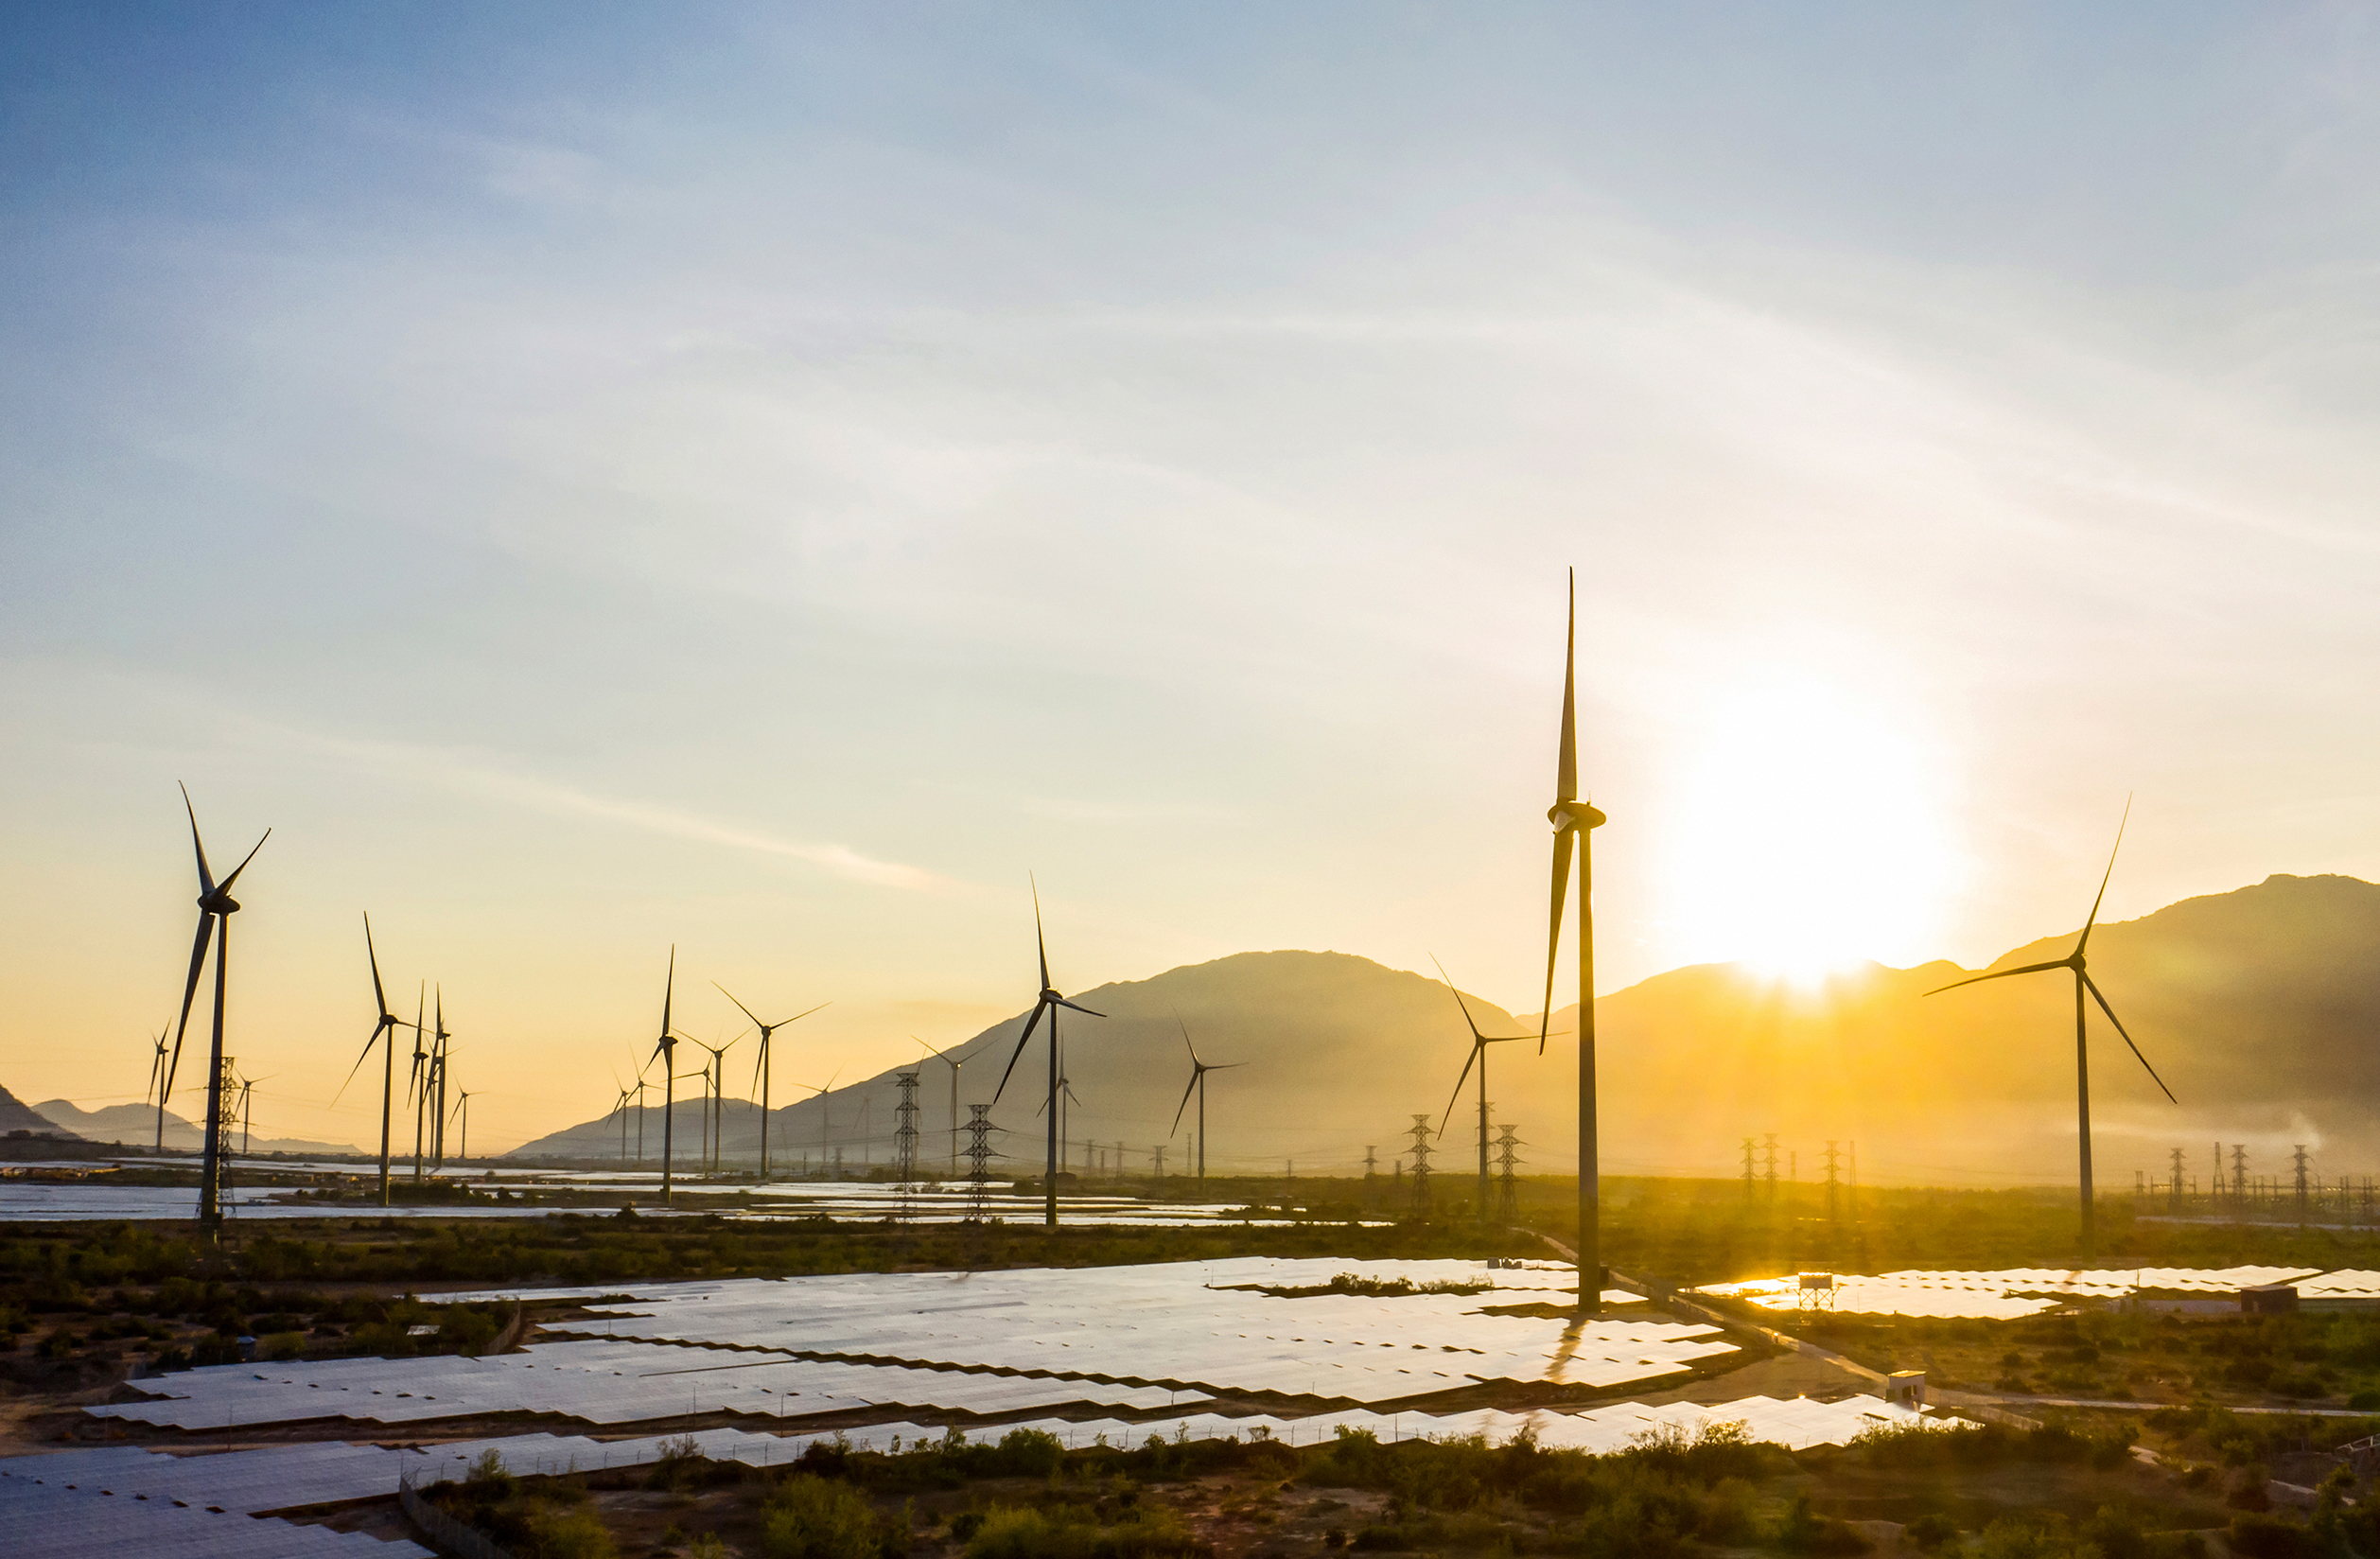 Vietnam all set for leading SE Asia in renewable energy